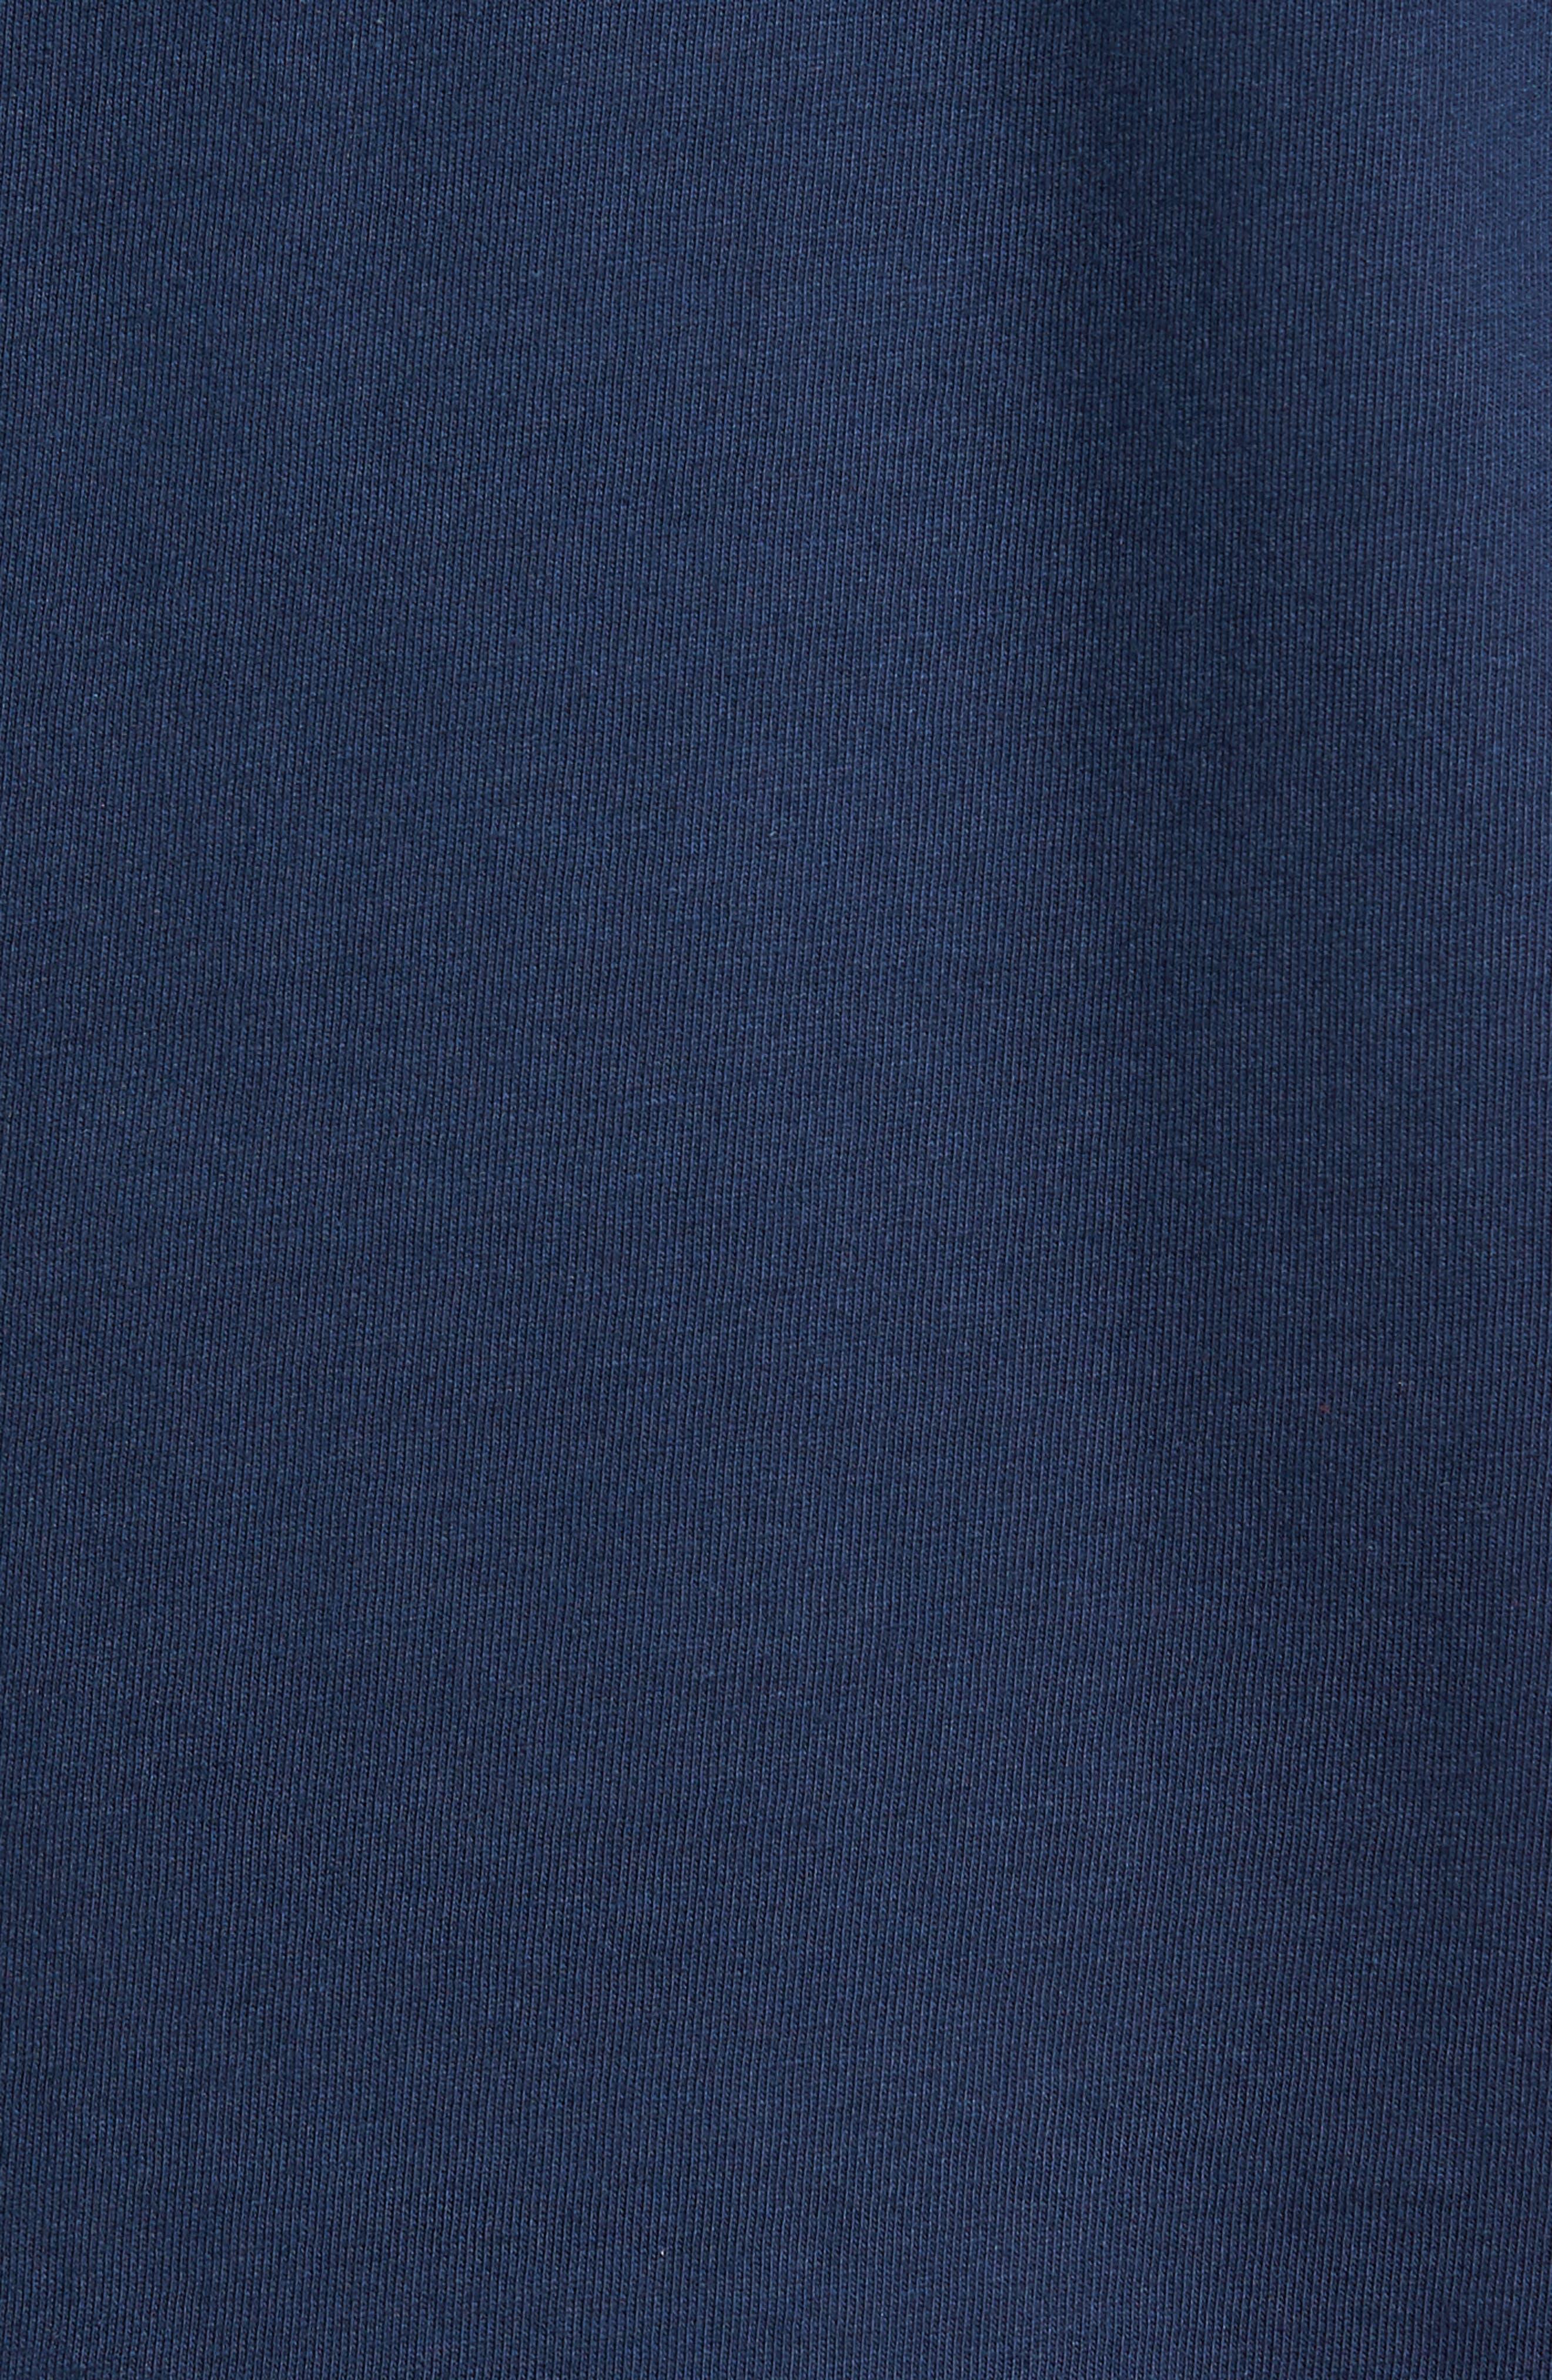 Alternate Image 5  - Tommy Bahama Big Boats Standard Fit T-Shirt